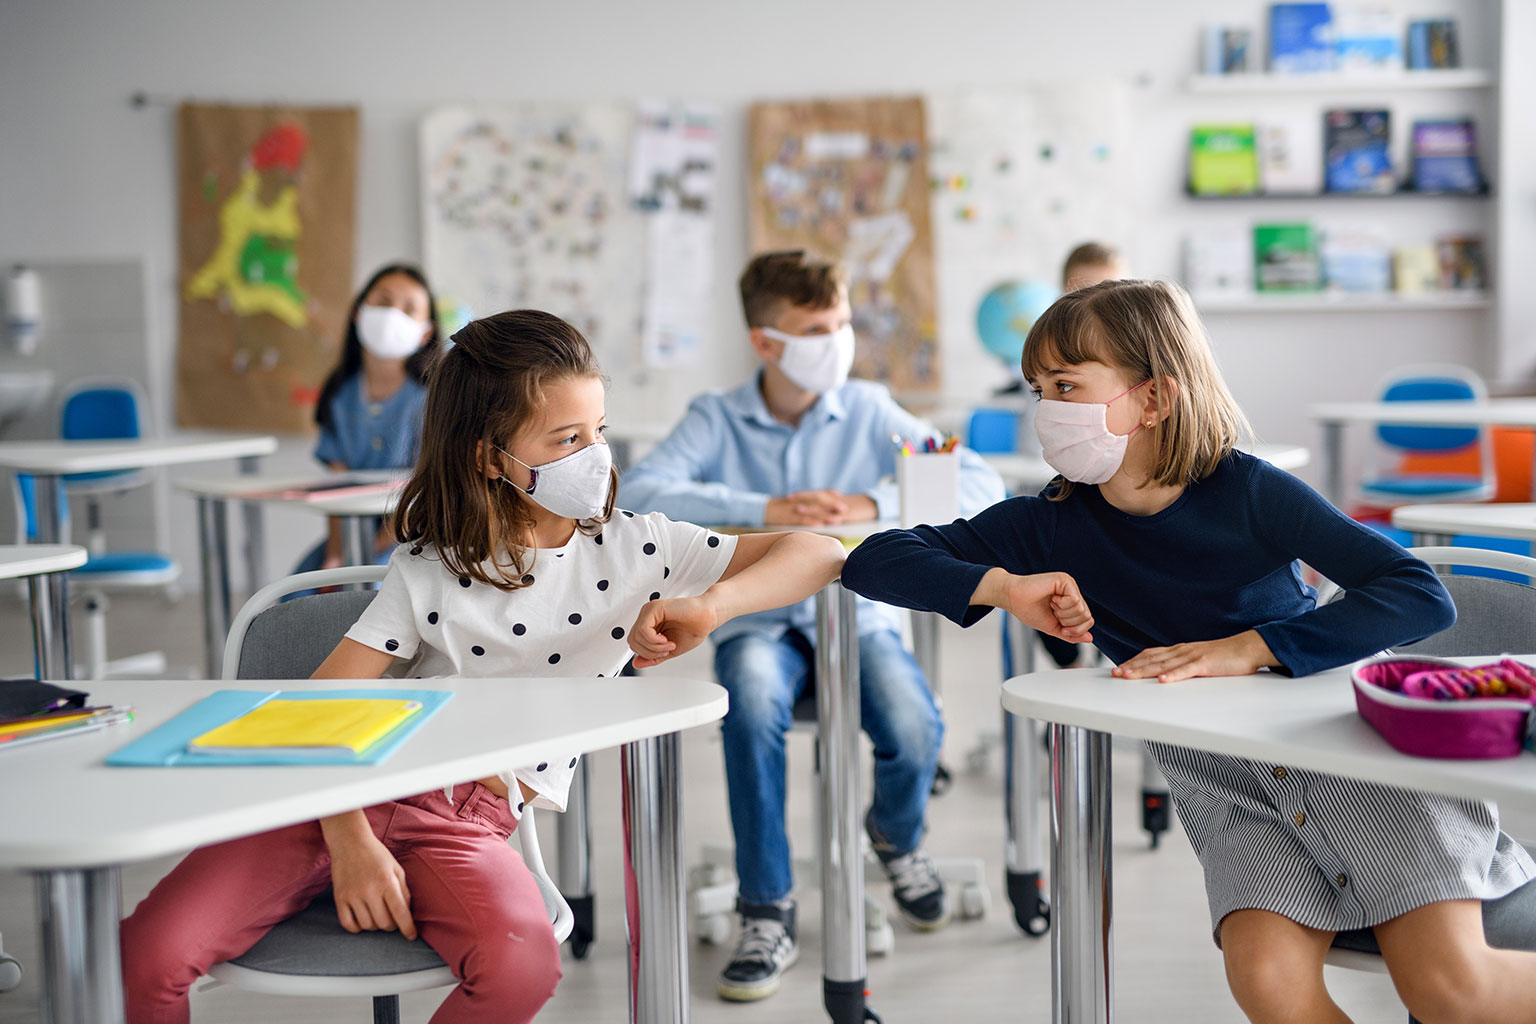 scuola regione lombardia mascherine